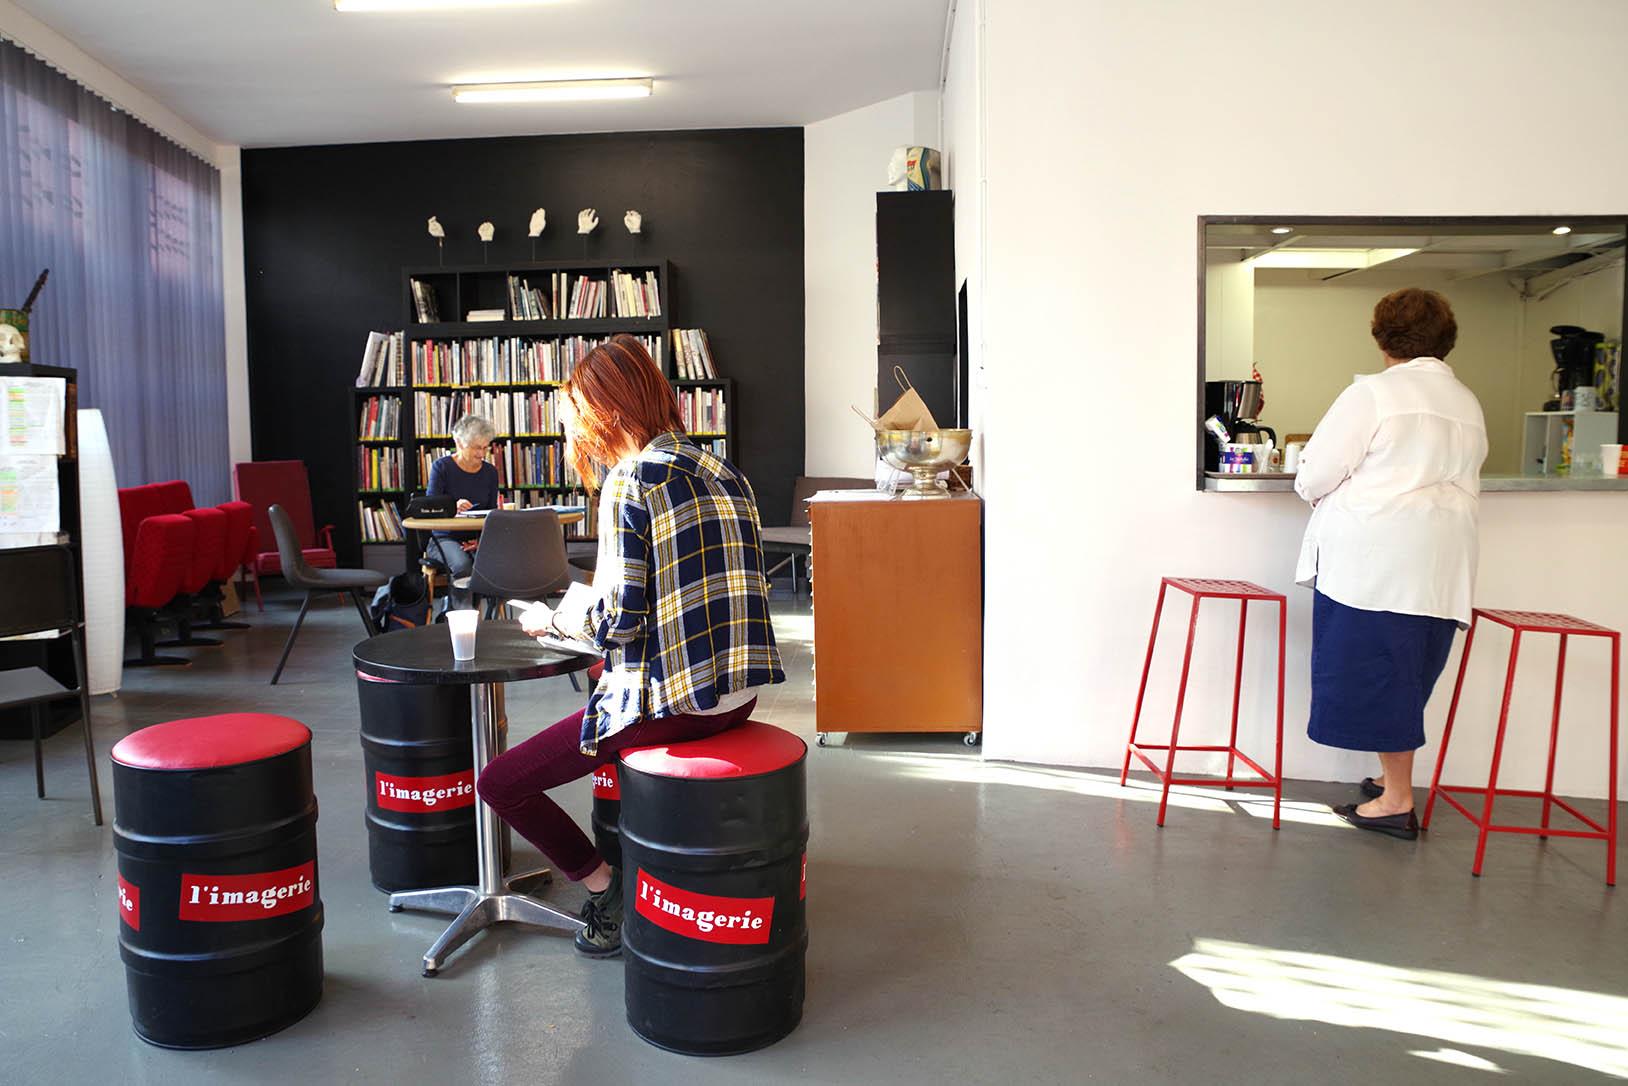 Atelier L'imagerie Toulouse